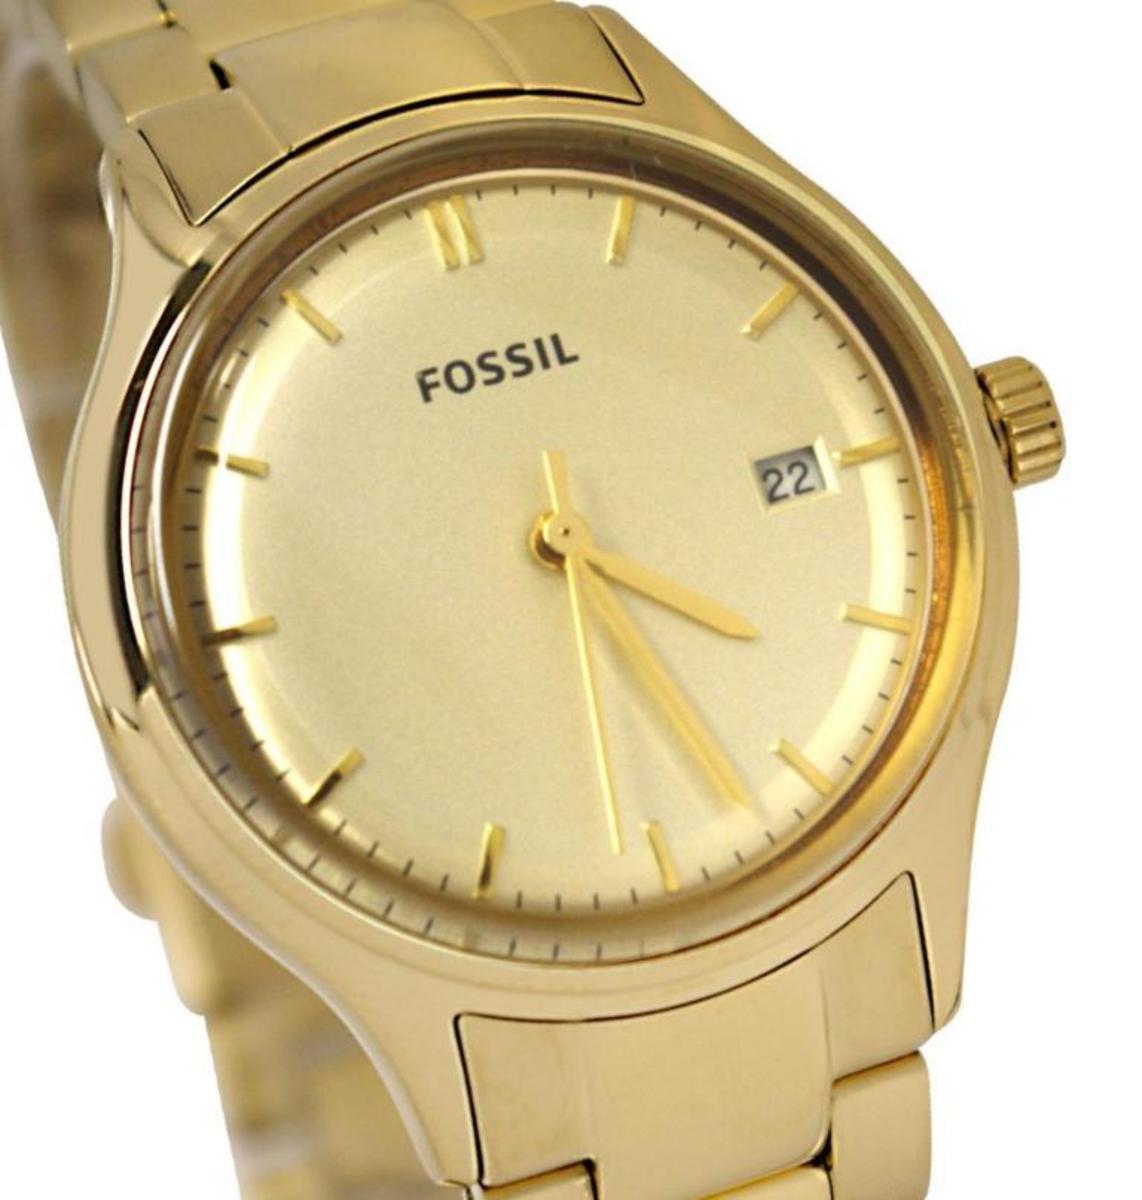 30e6a2223faf RELOJ FOSSIL 3161 cod ES3161 - Fossil - New York Store No Paraguay - Tienda  Online de Ropas